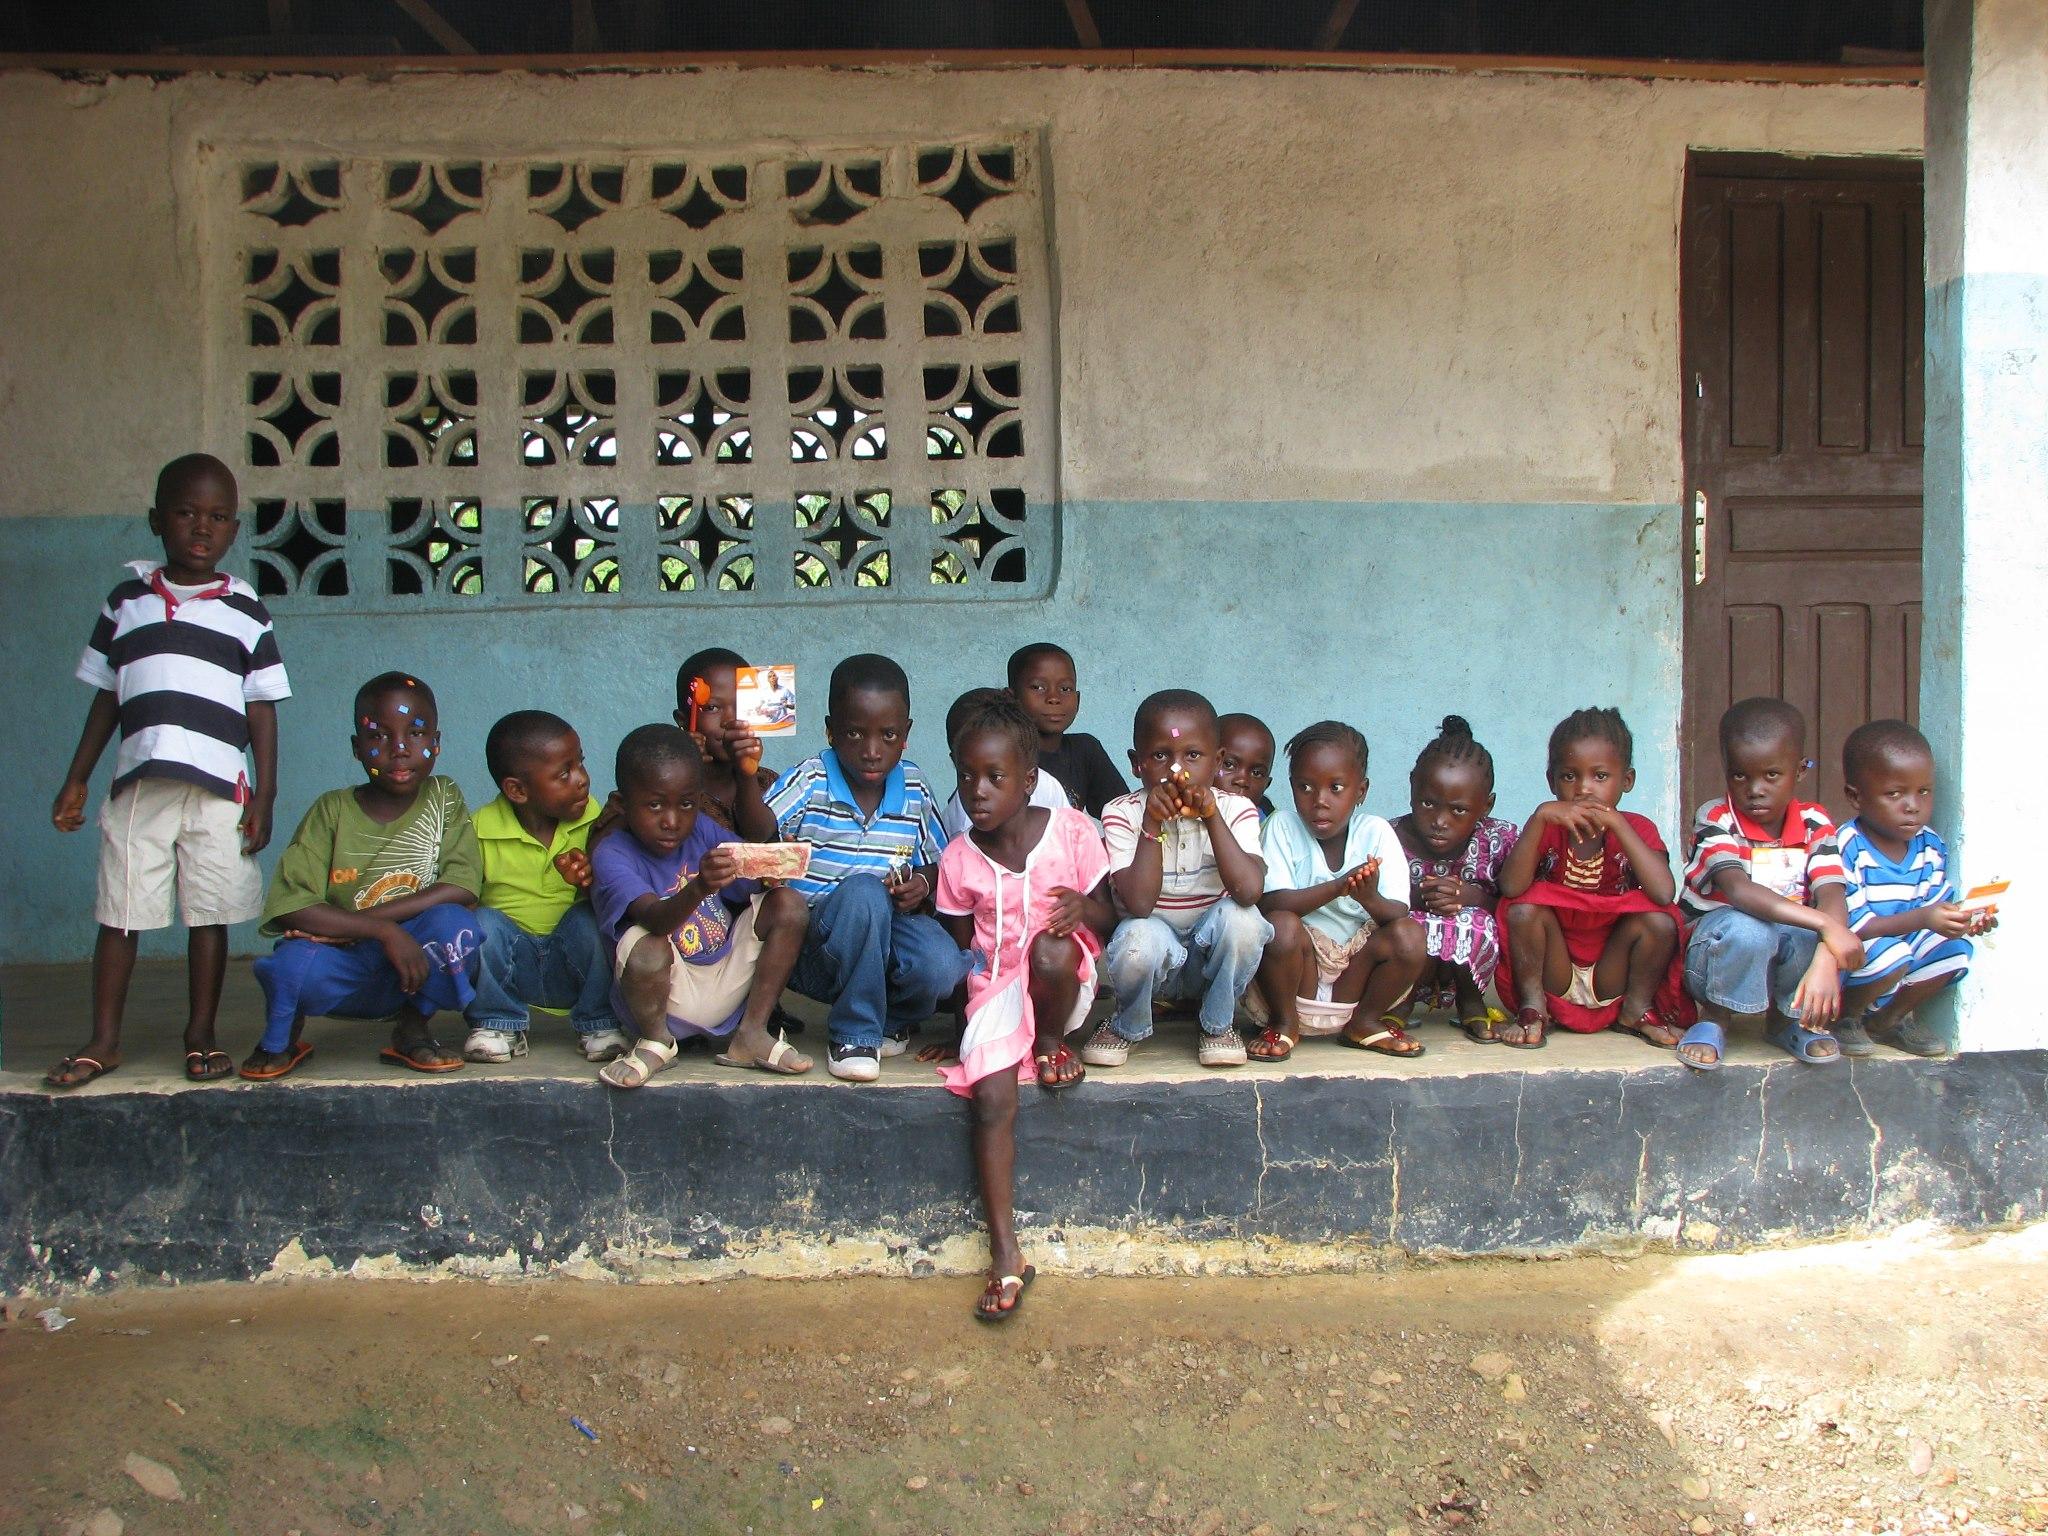 Students at Balama Elementary School